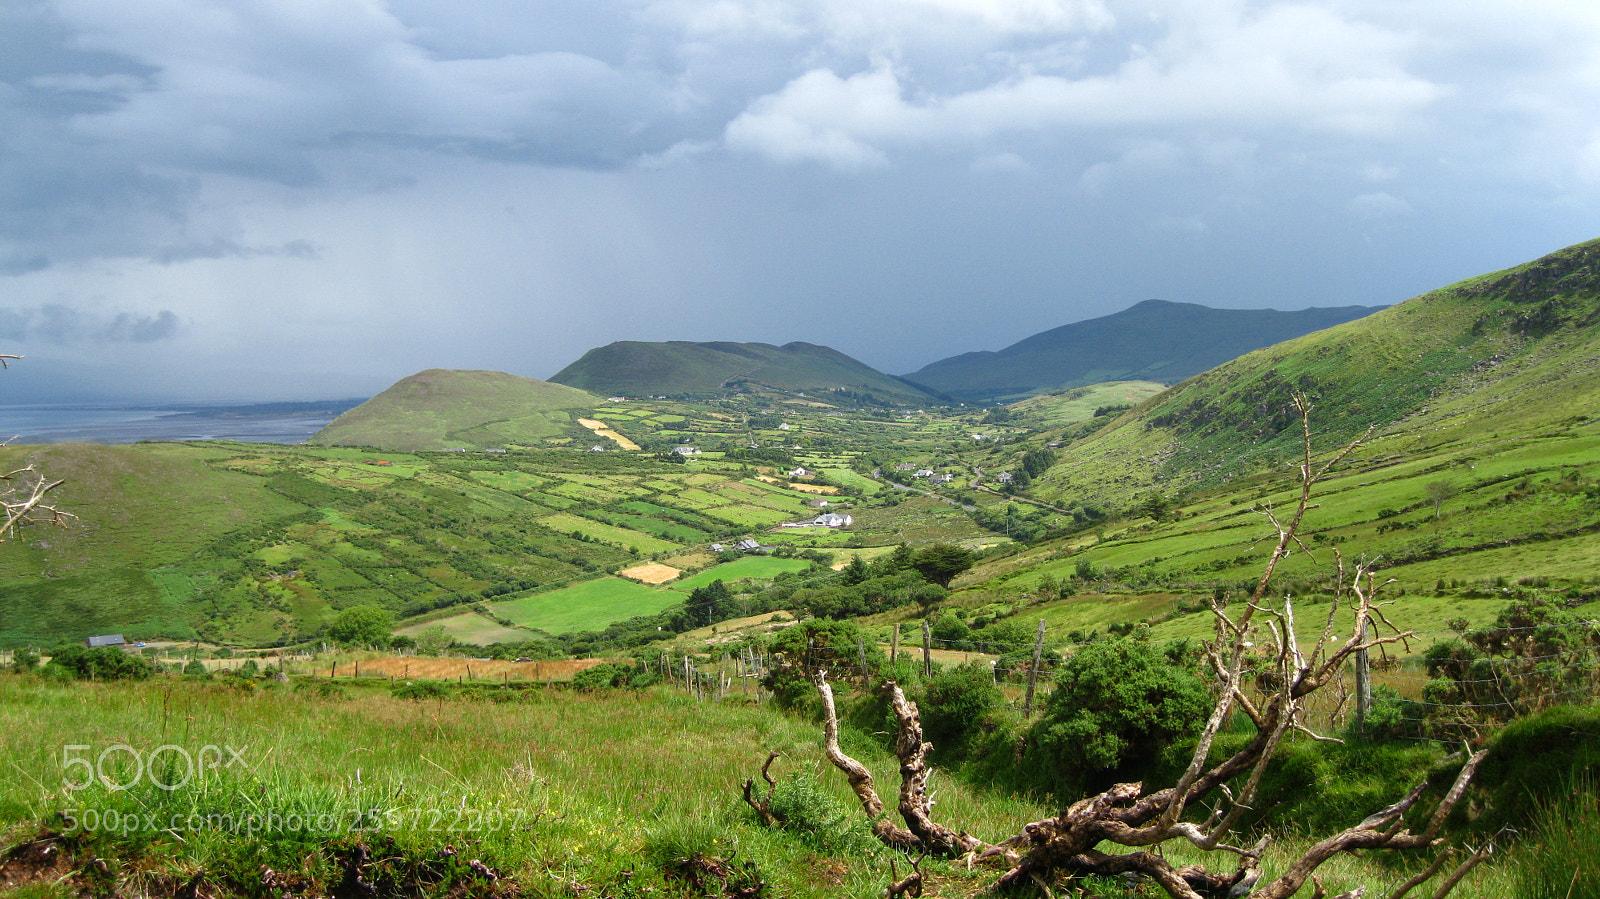 Irish Scenery, Canon POWERSHOT A3150 IS